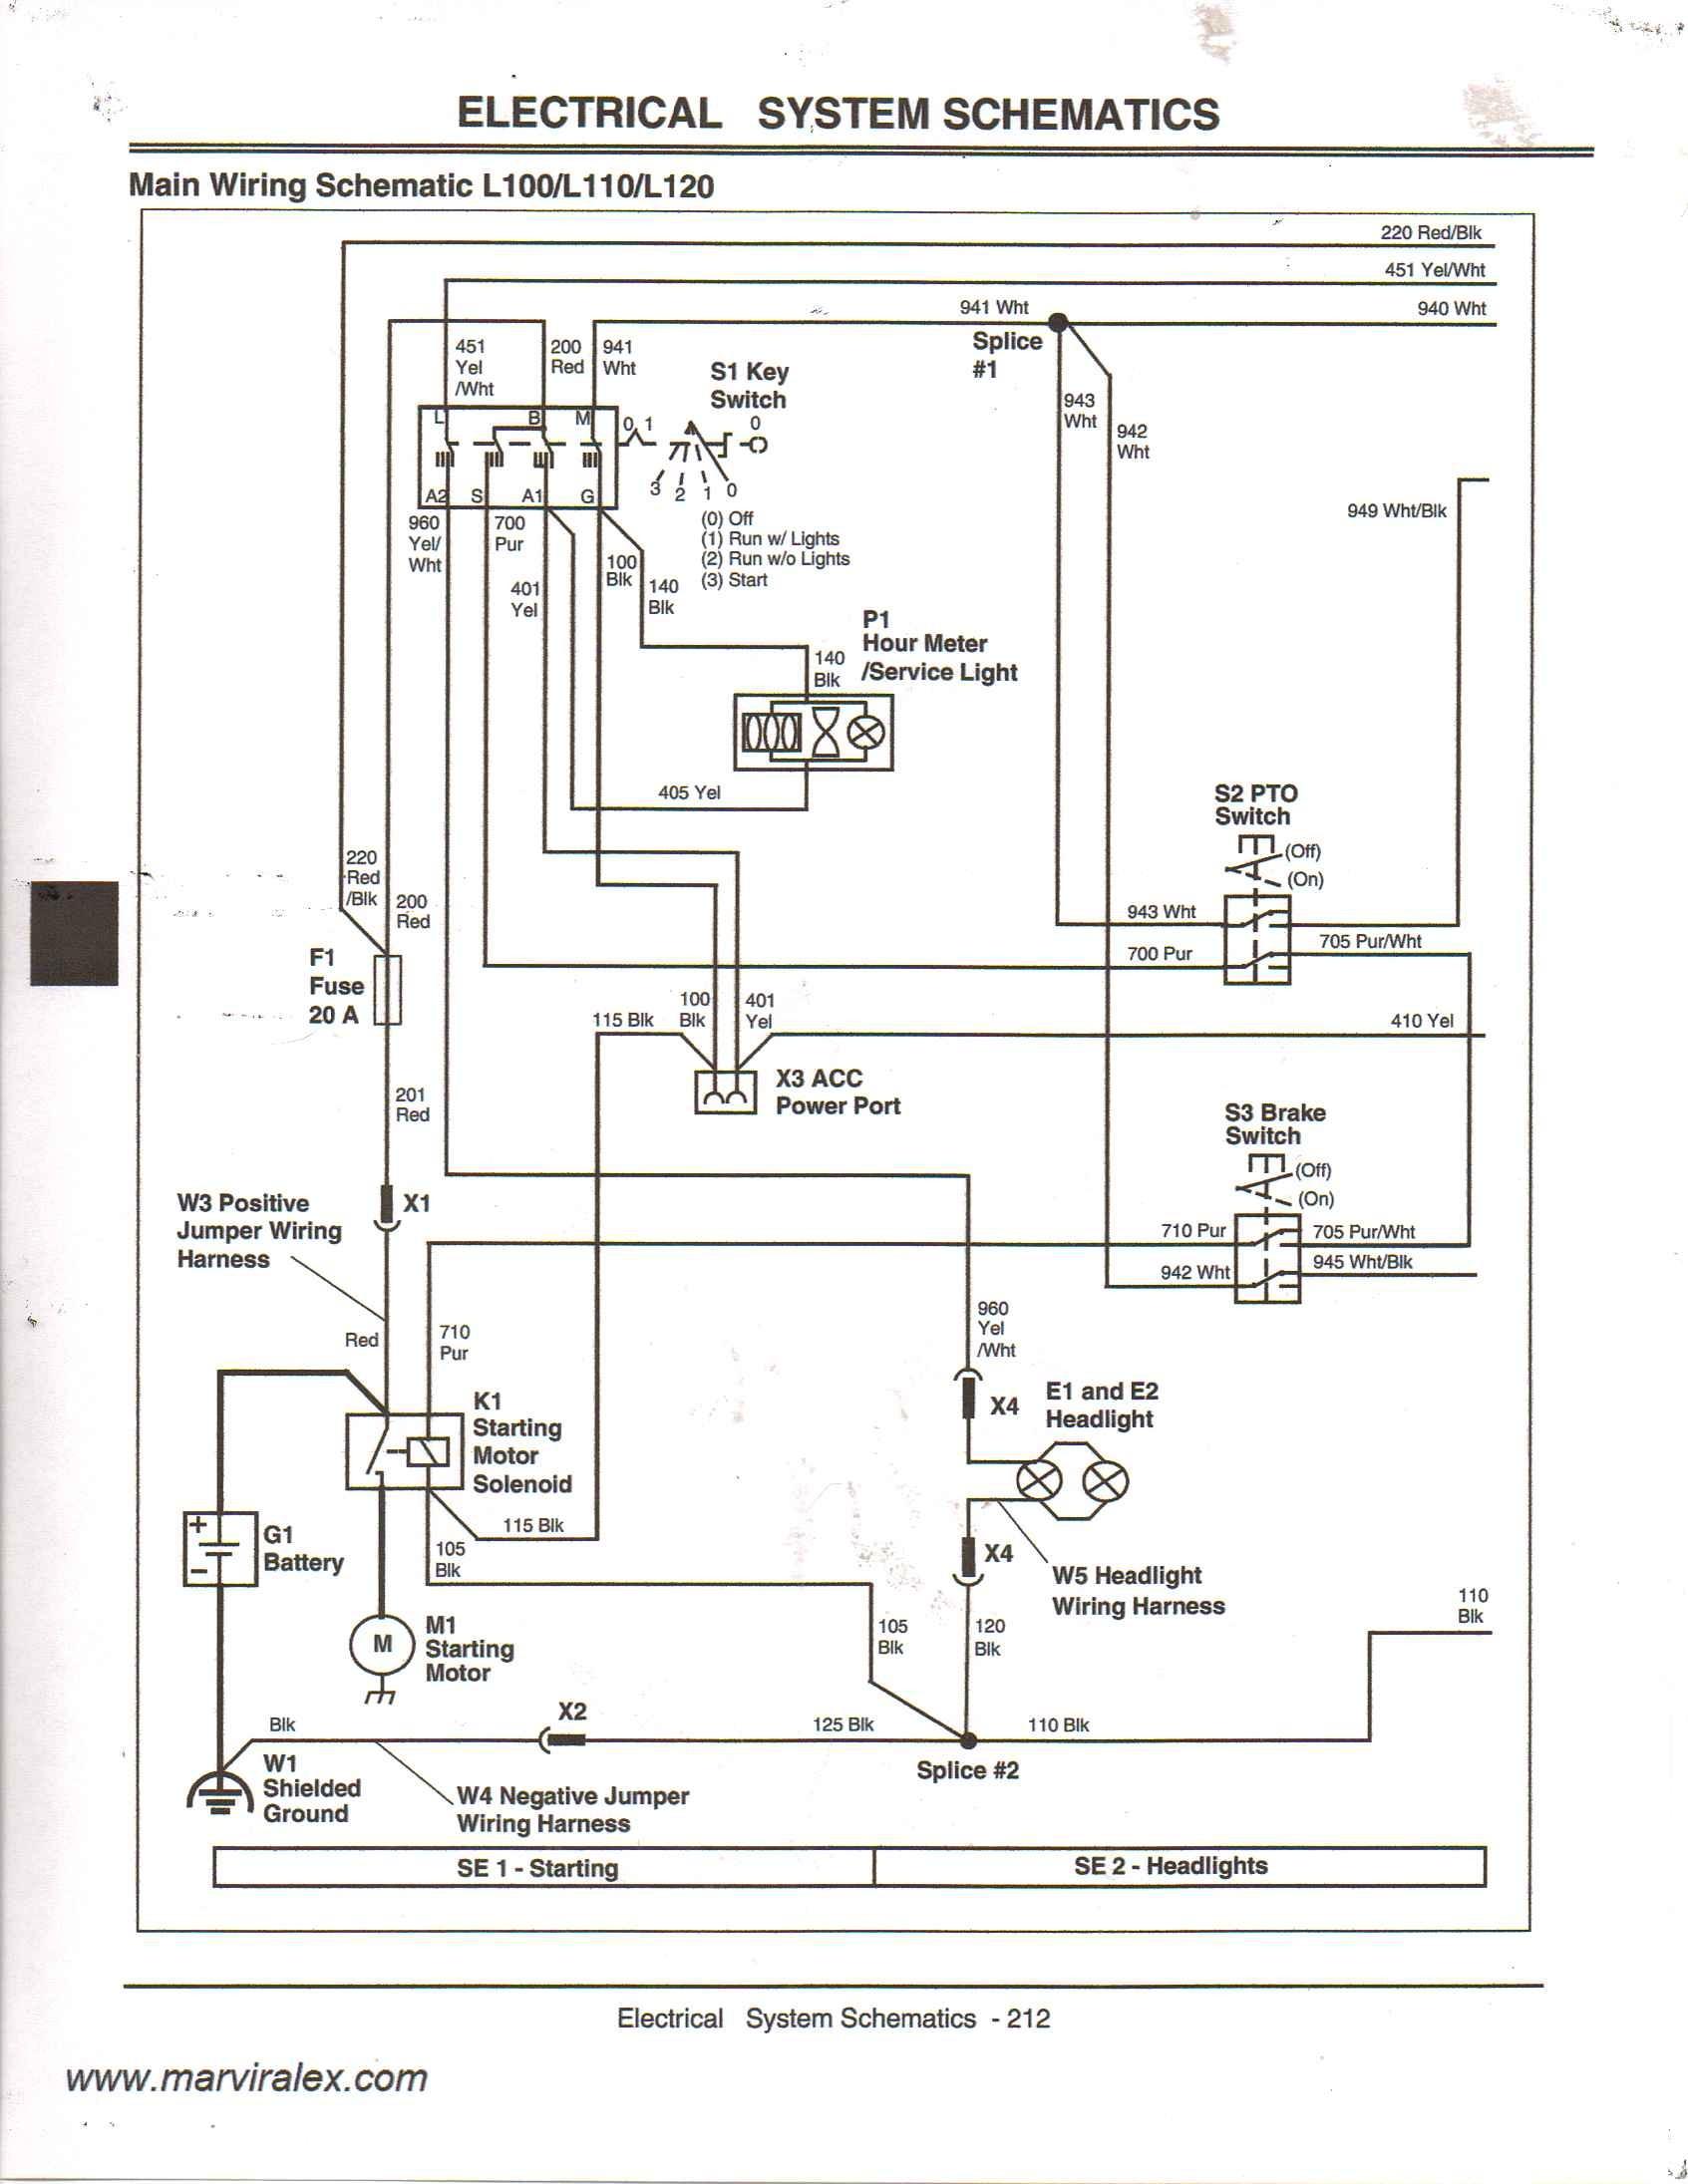 John Deere 318 Wiring Diagram Pdf Cb 4290] for John Deere 1050 Tractor Wiring Diagram Of John Deere 318 Wiring Diagram Pdf 56d25 John Deere 655 Wiring Diagram